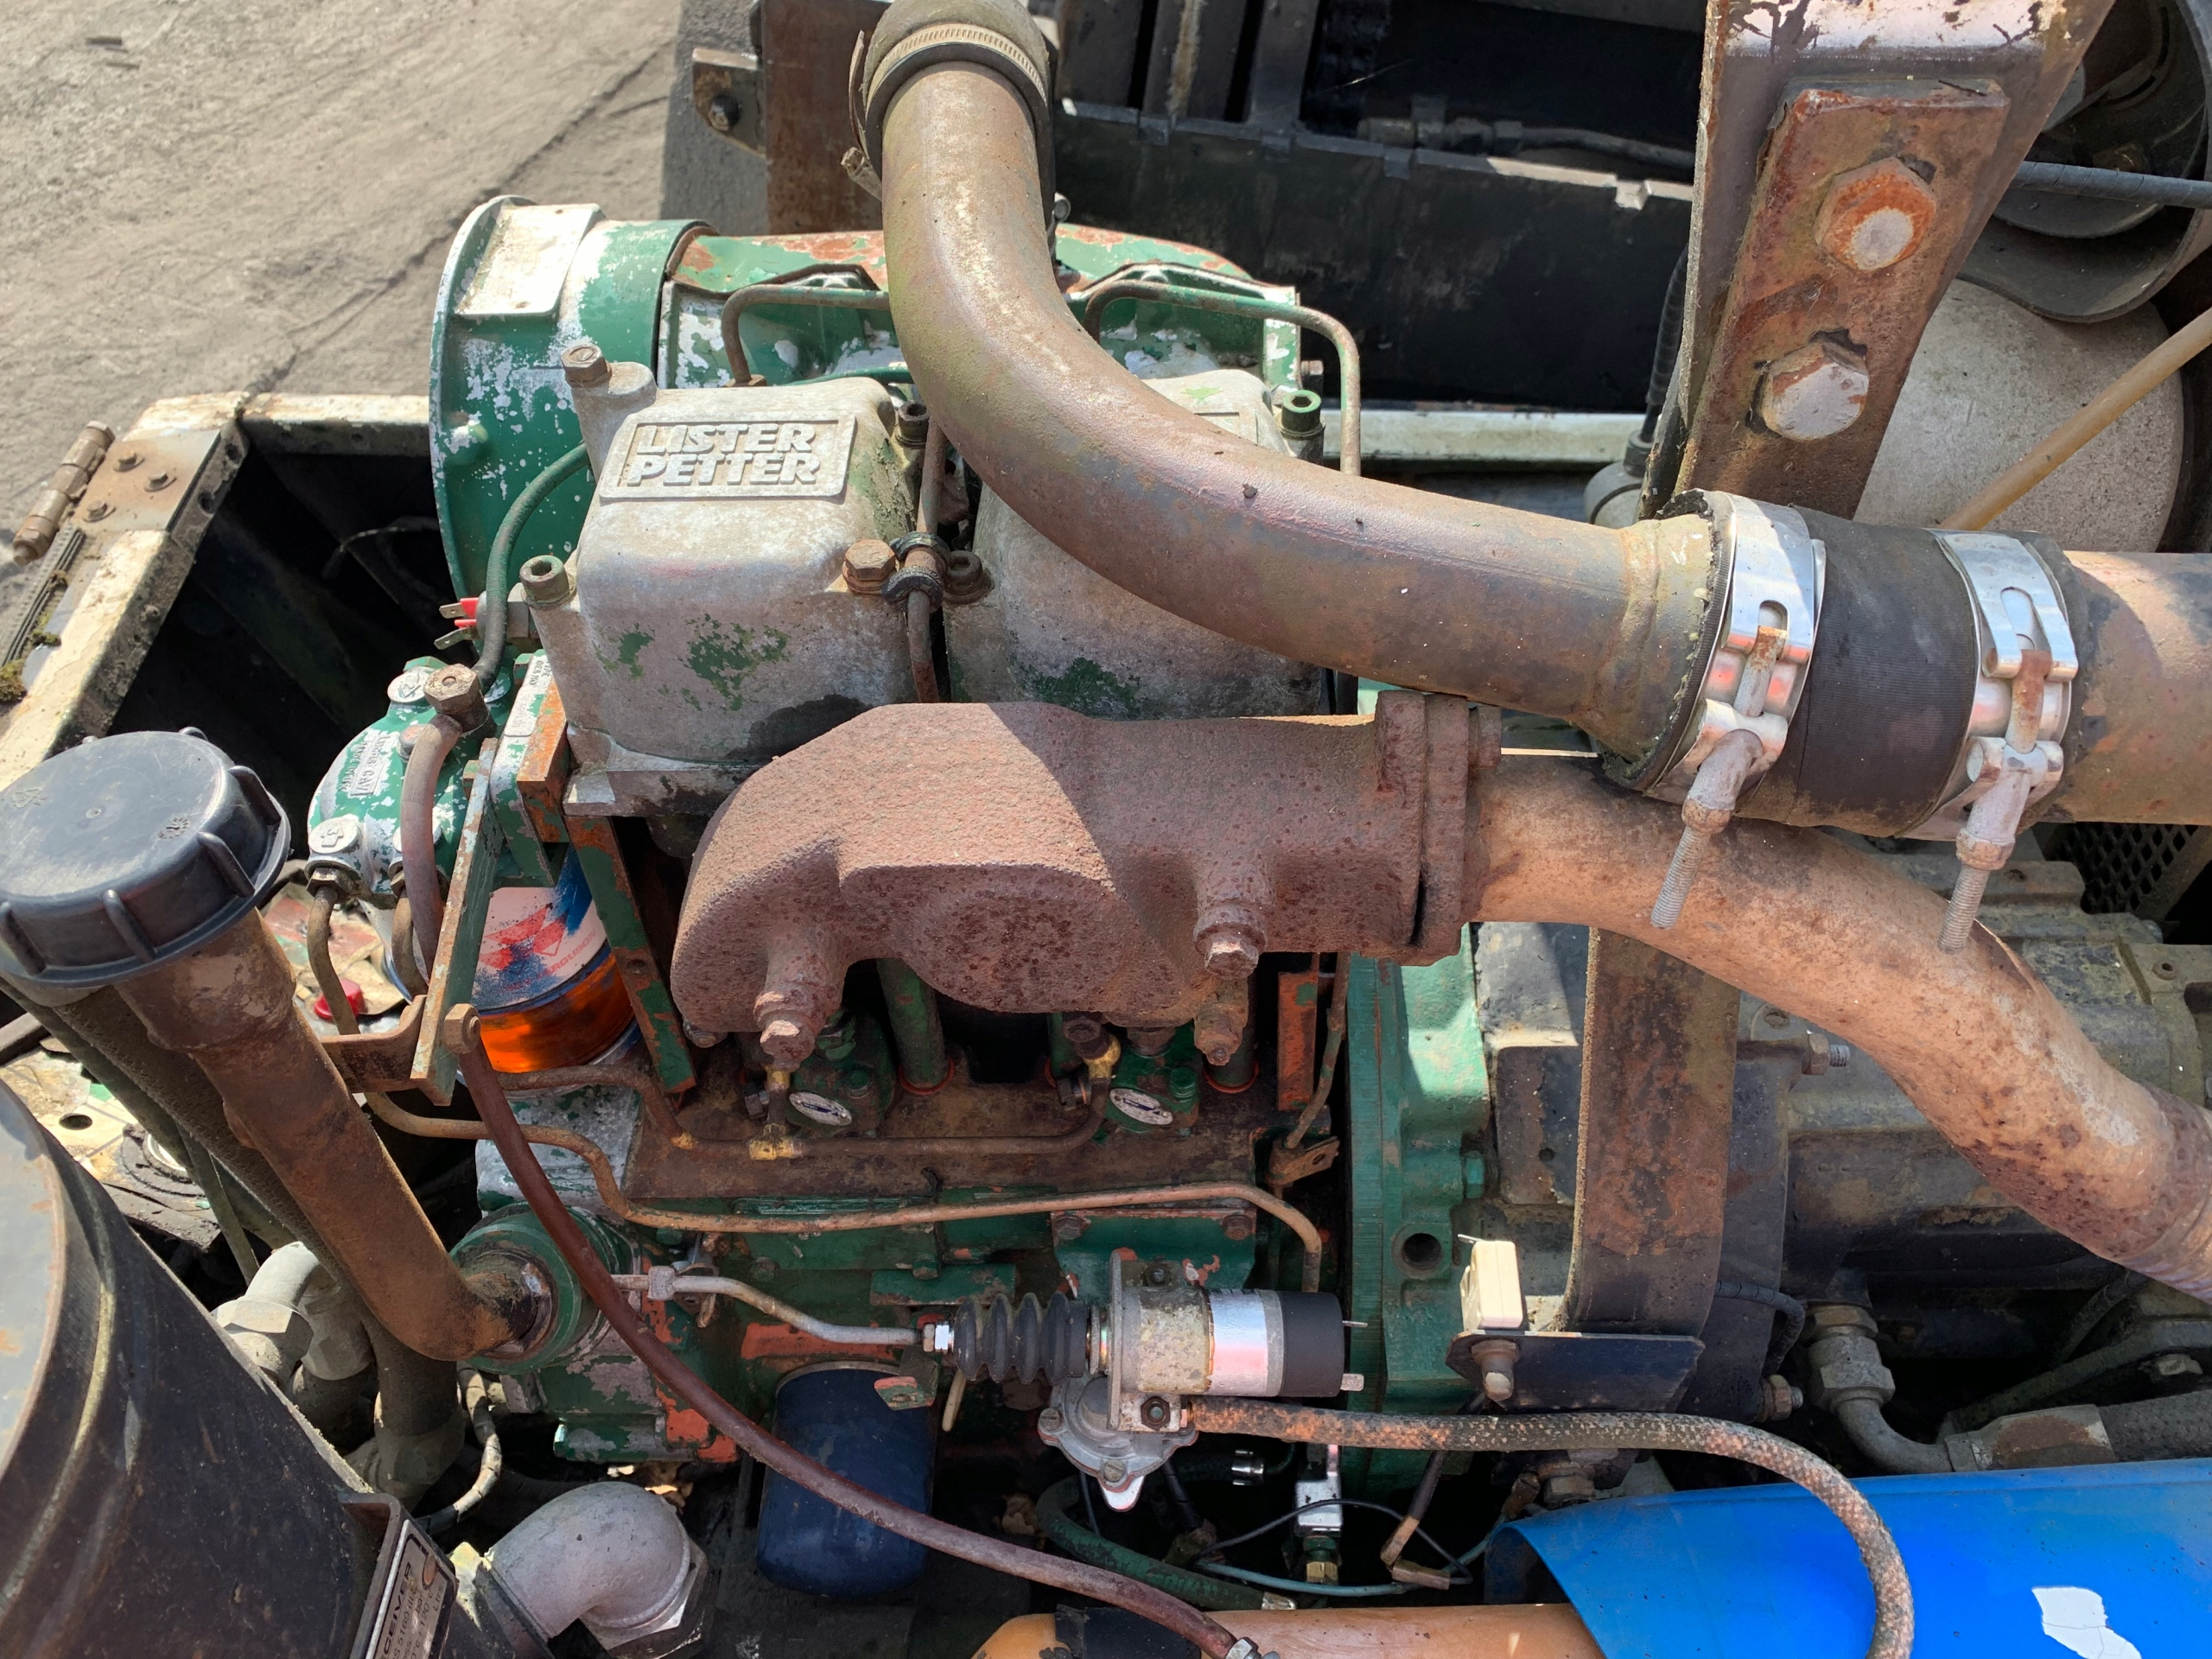 Silnik diesel Lister Petter 2 cylidrowy 1314h